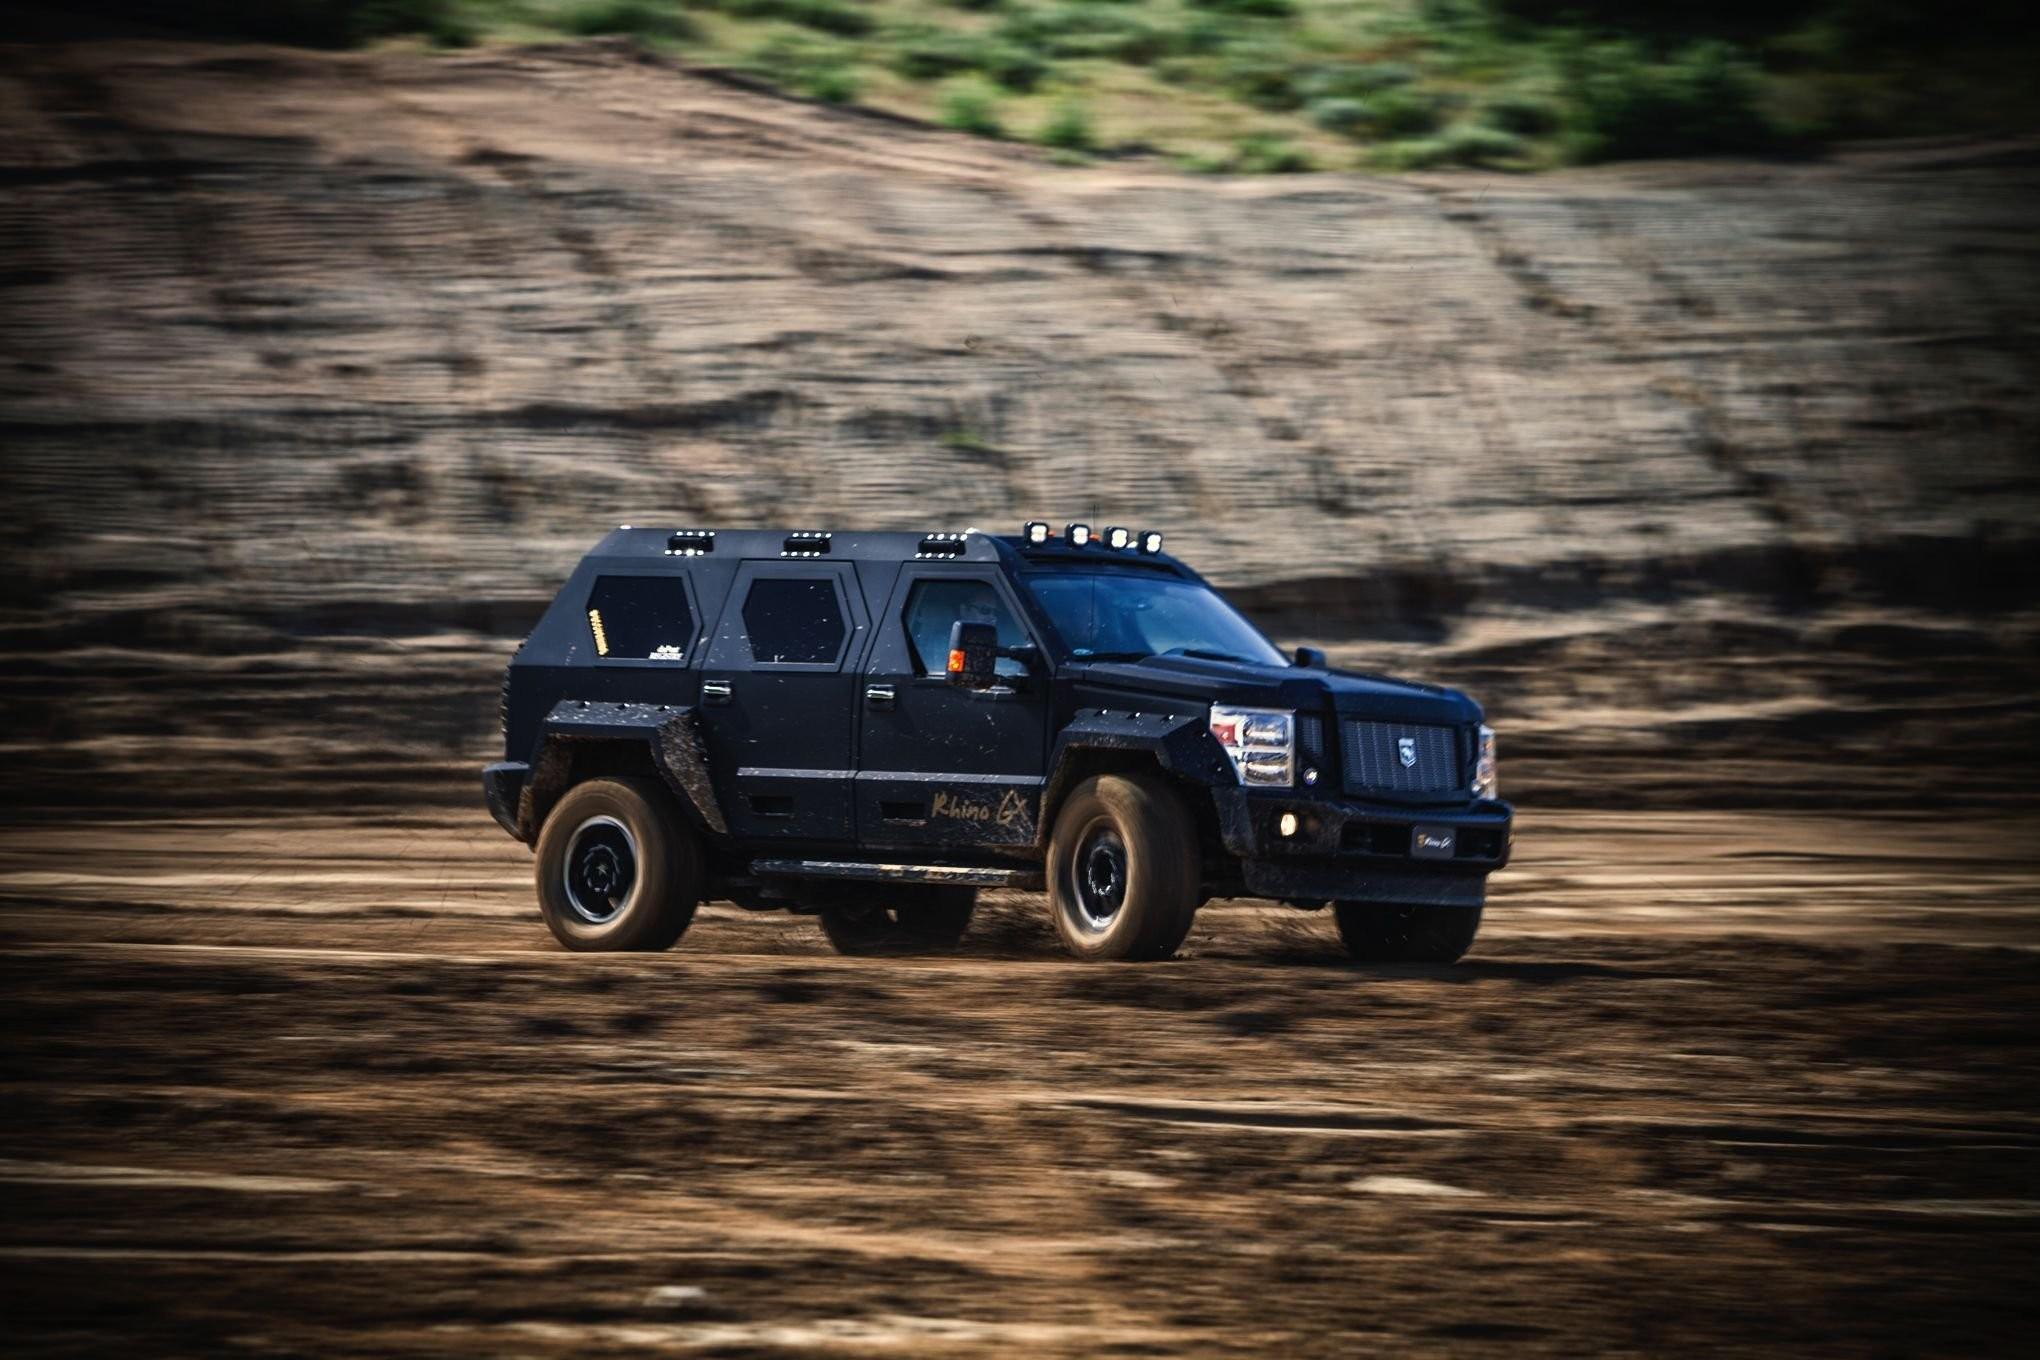 2006 Ussv Rhino Gx Ford F450 Four Wheeler Stuart Bourdon suv 4×4 armored  wallpaper | | 987420 | WallpaperUP